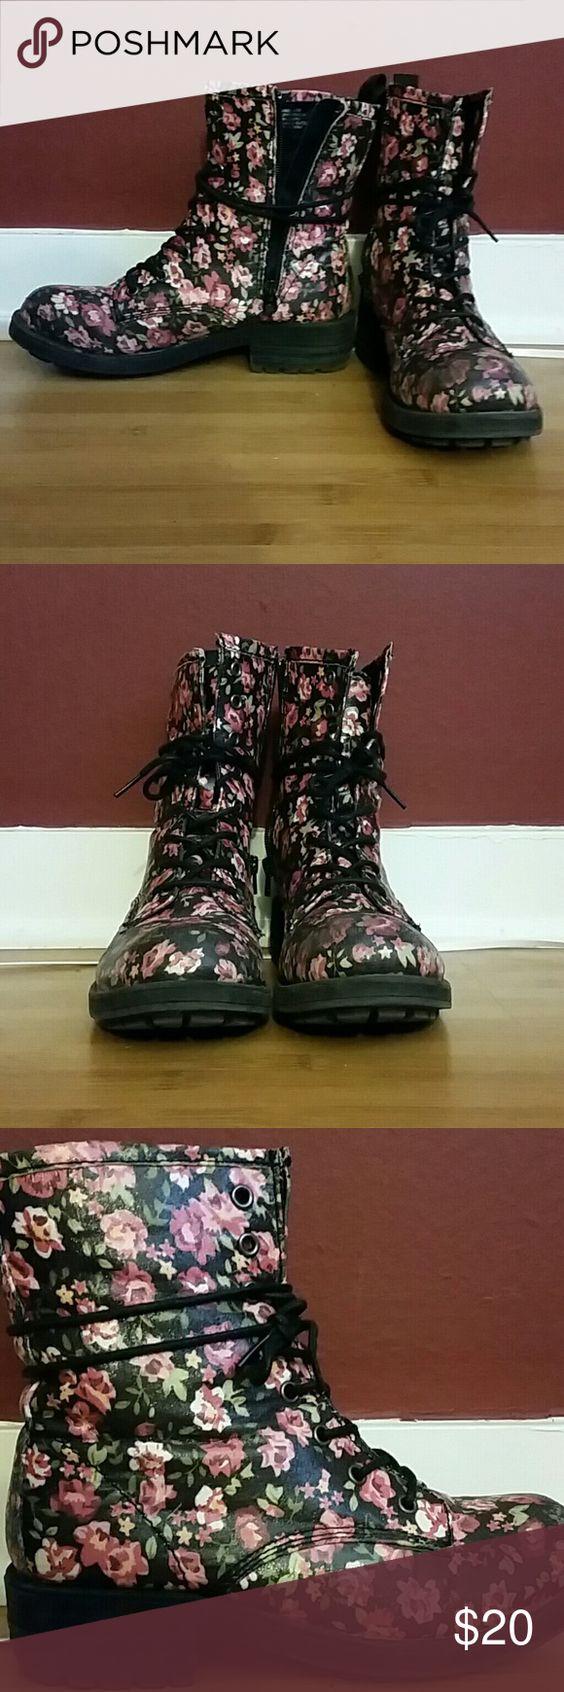 Madden Girl floral combat boots Madden Girl floral print combat ...